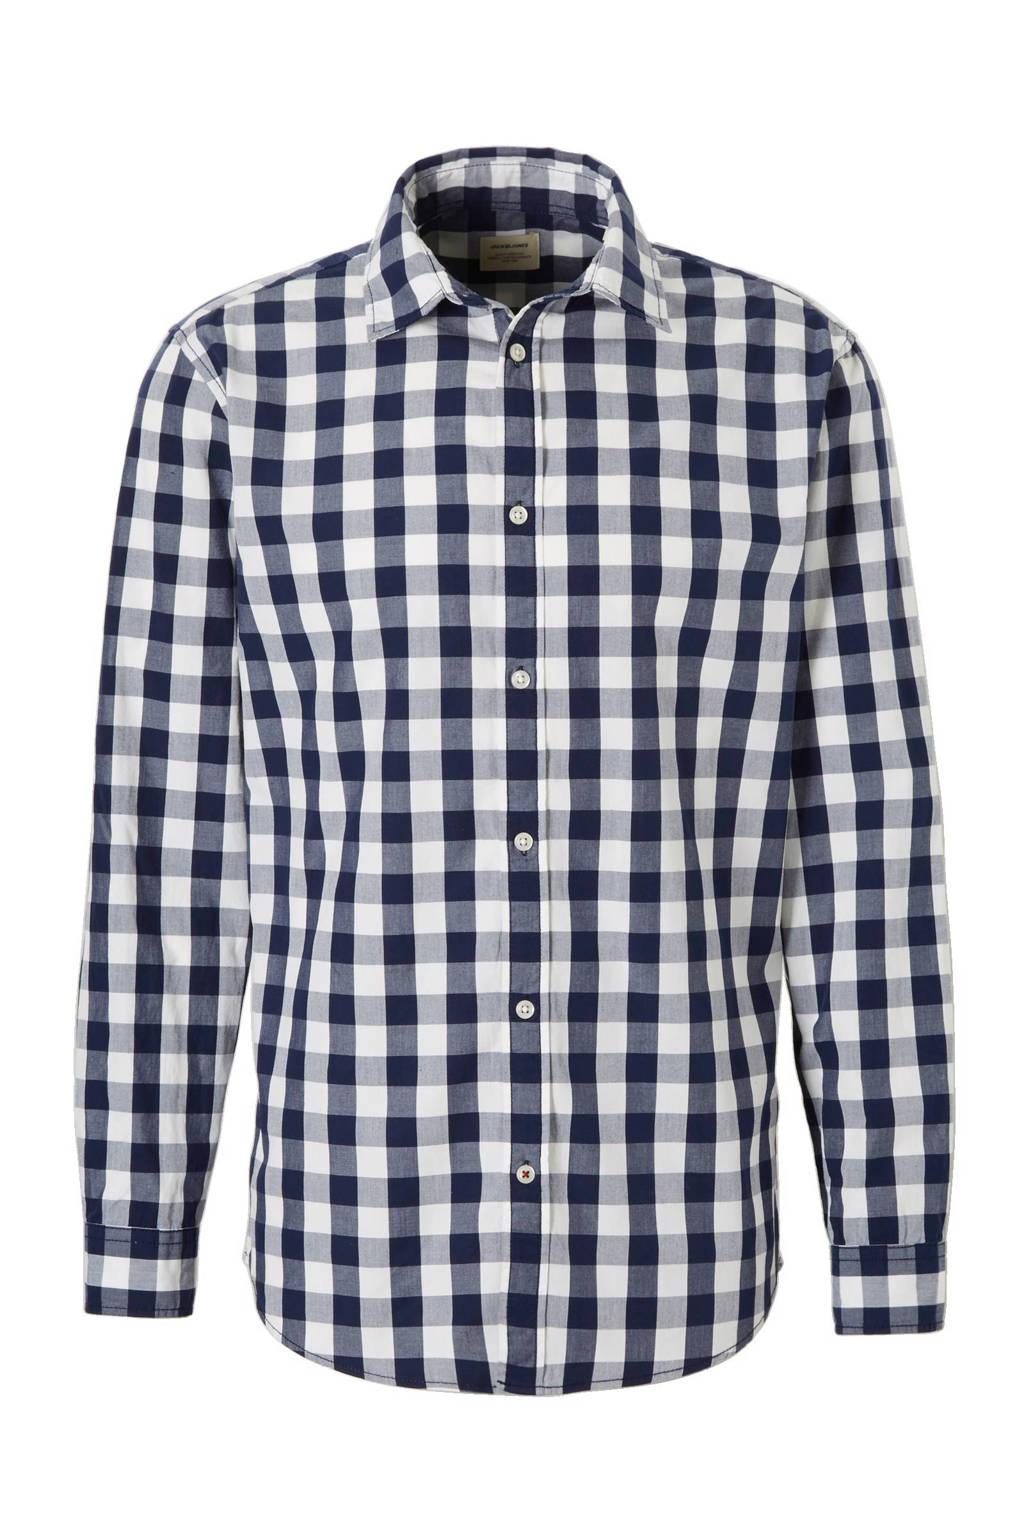 JACK & JONES ESSENTIALS Gingham regular fit overhemd, Wit/marine